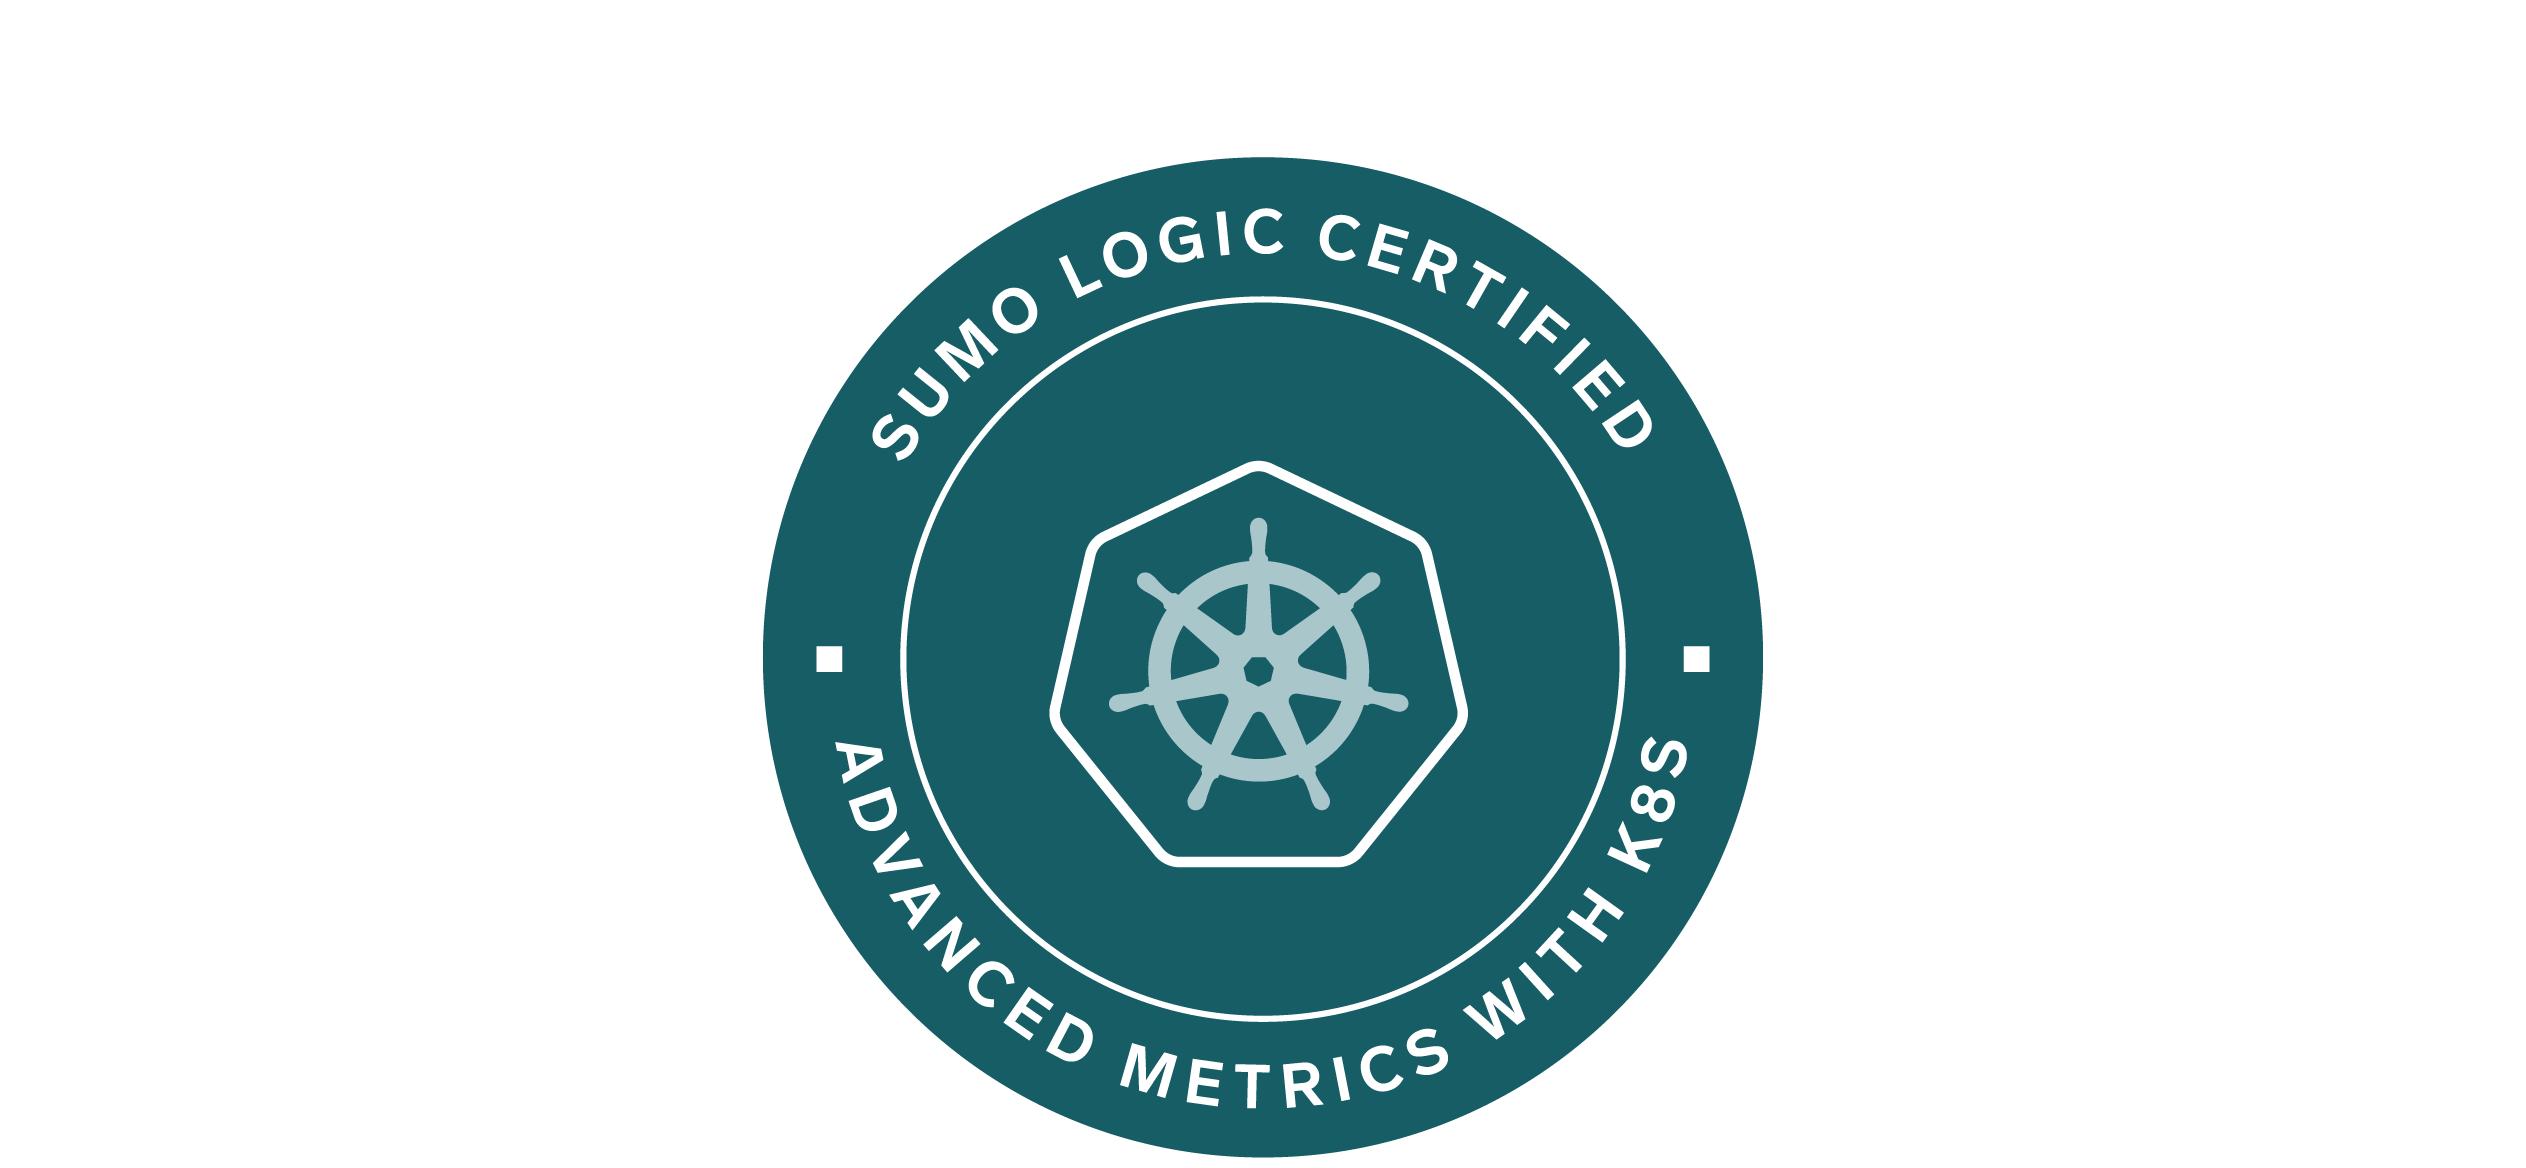 Certification advanced metrics k8s